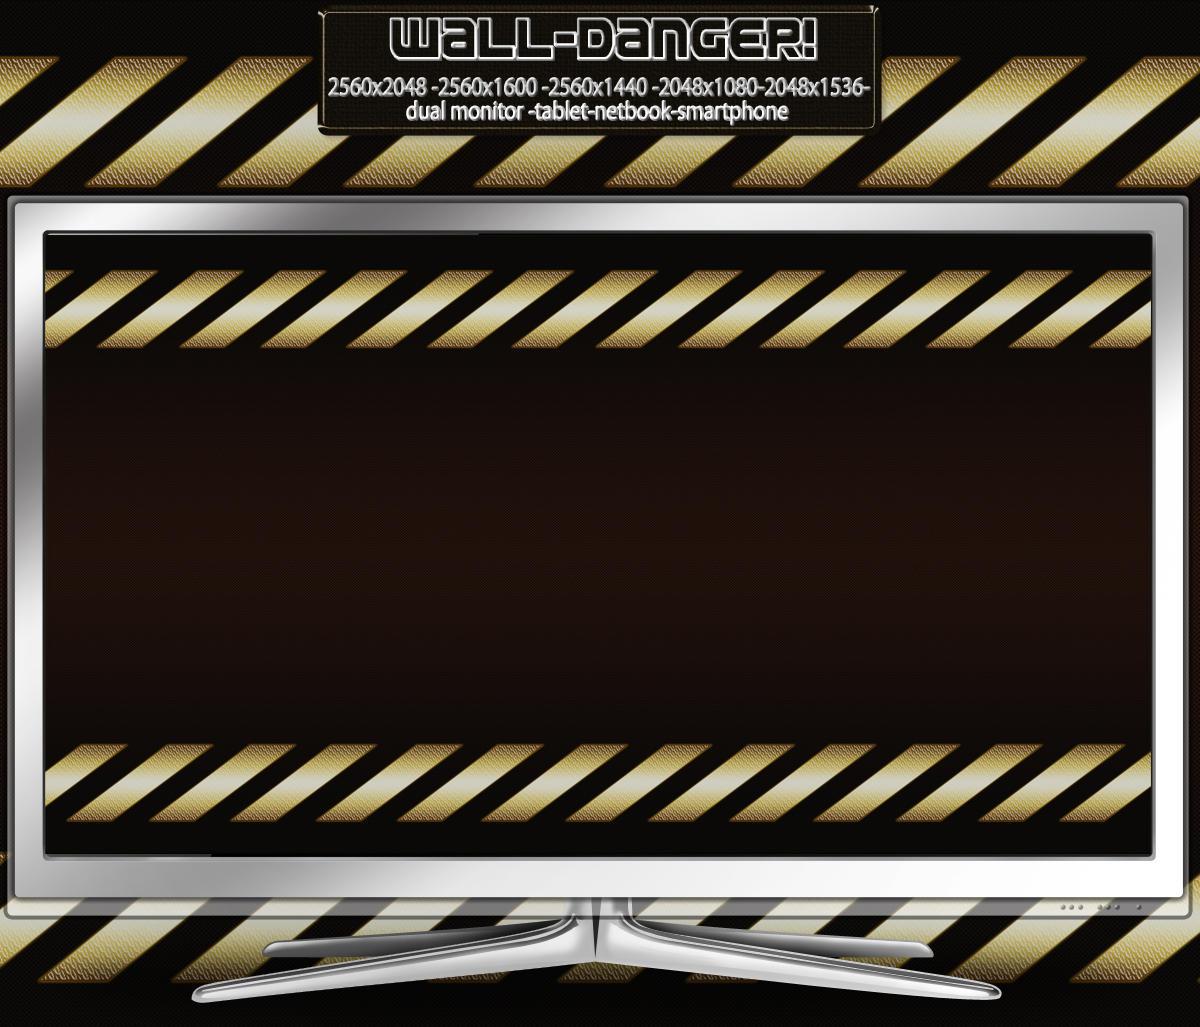 Wall-Danger by ilnanny